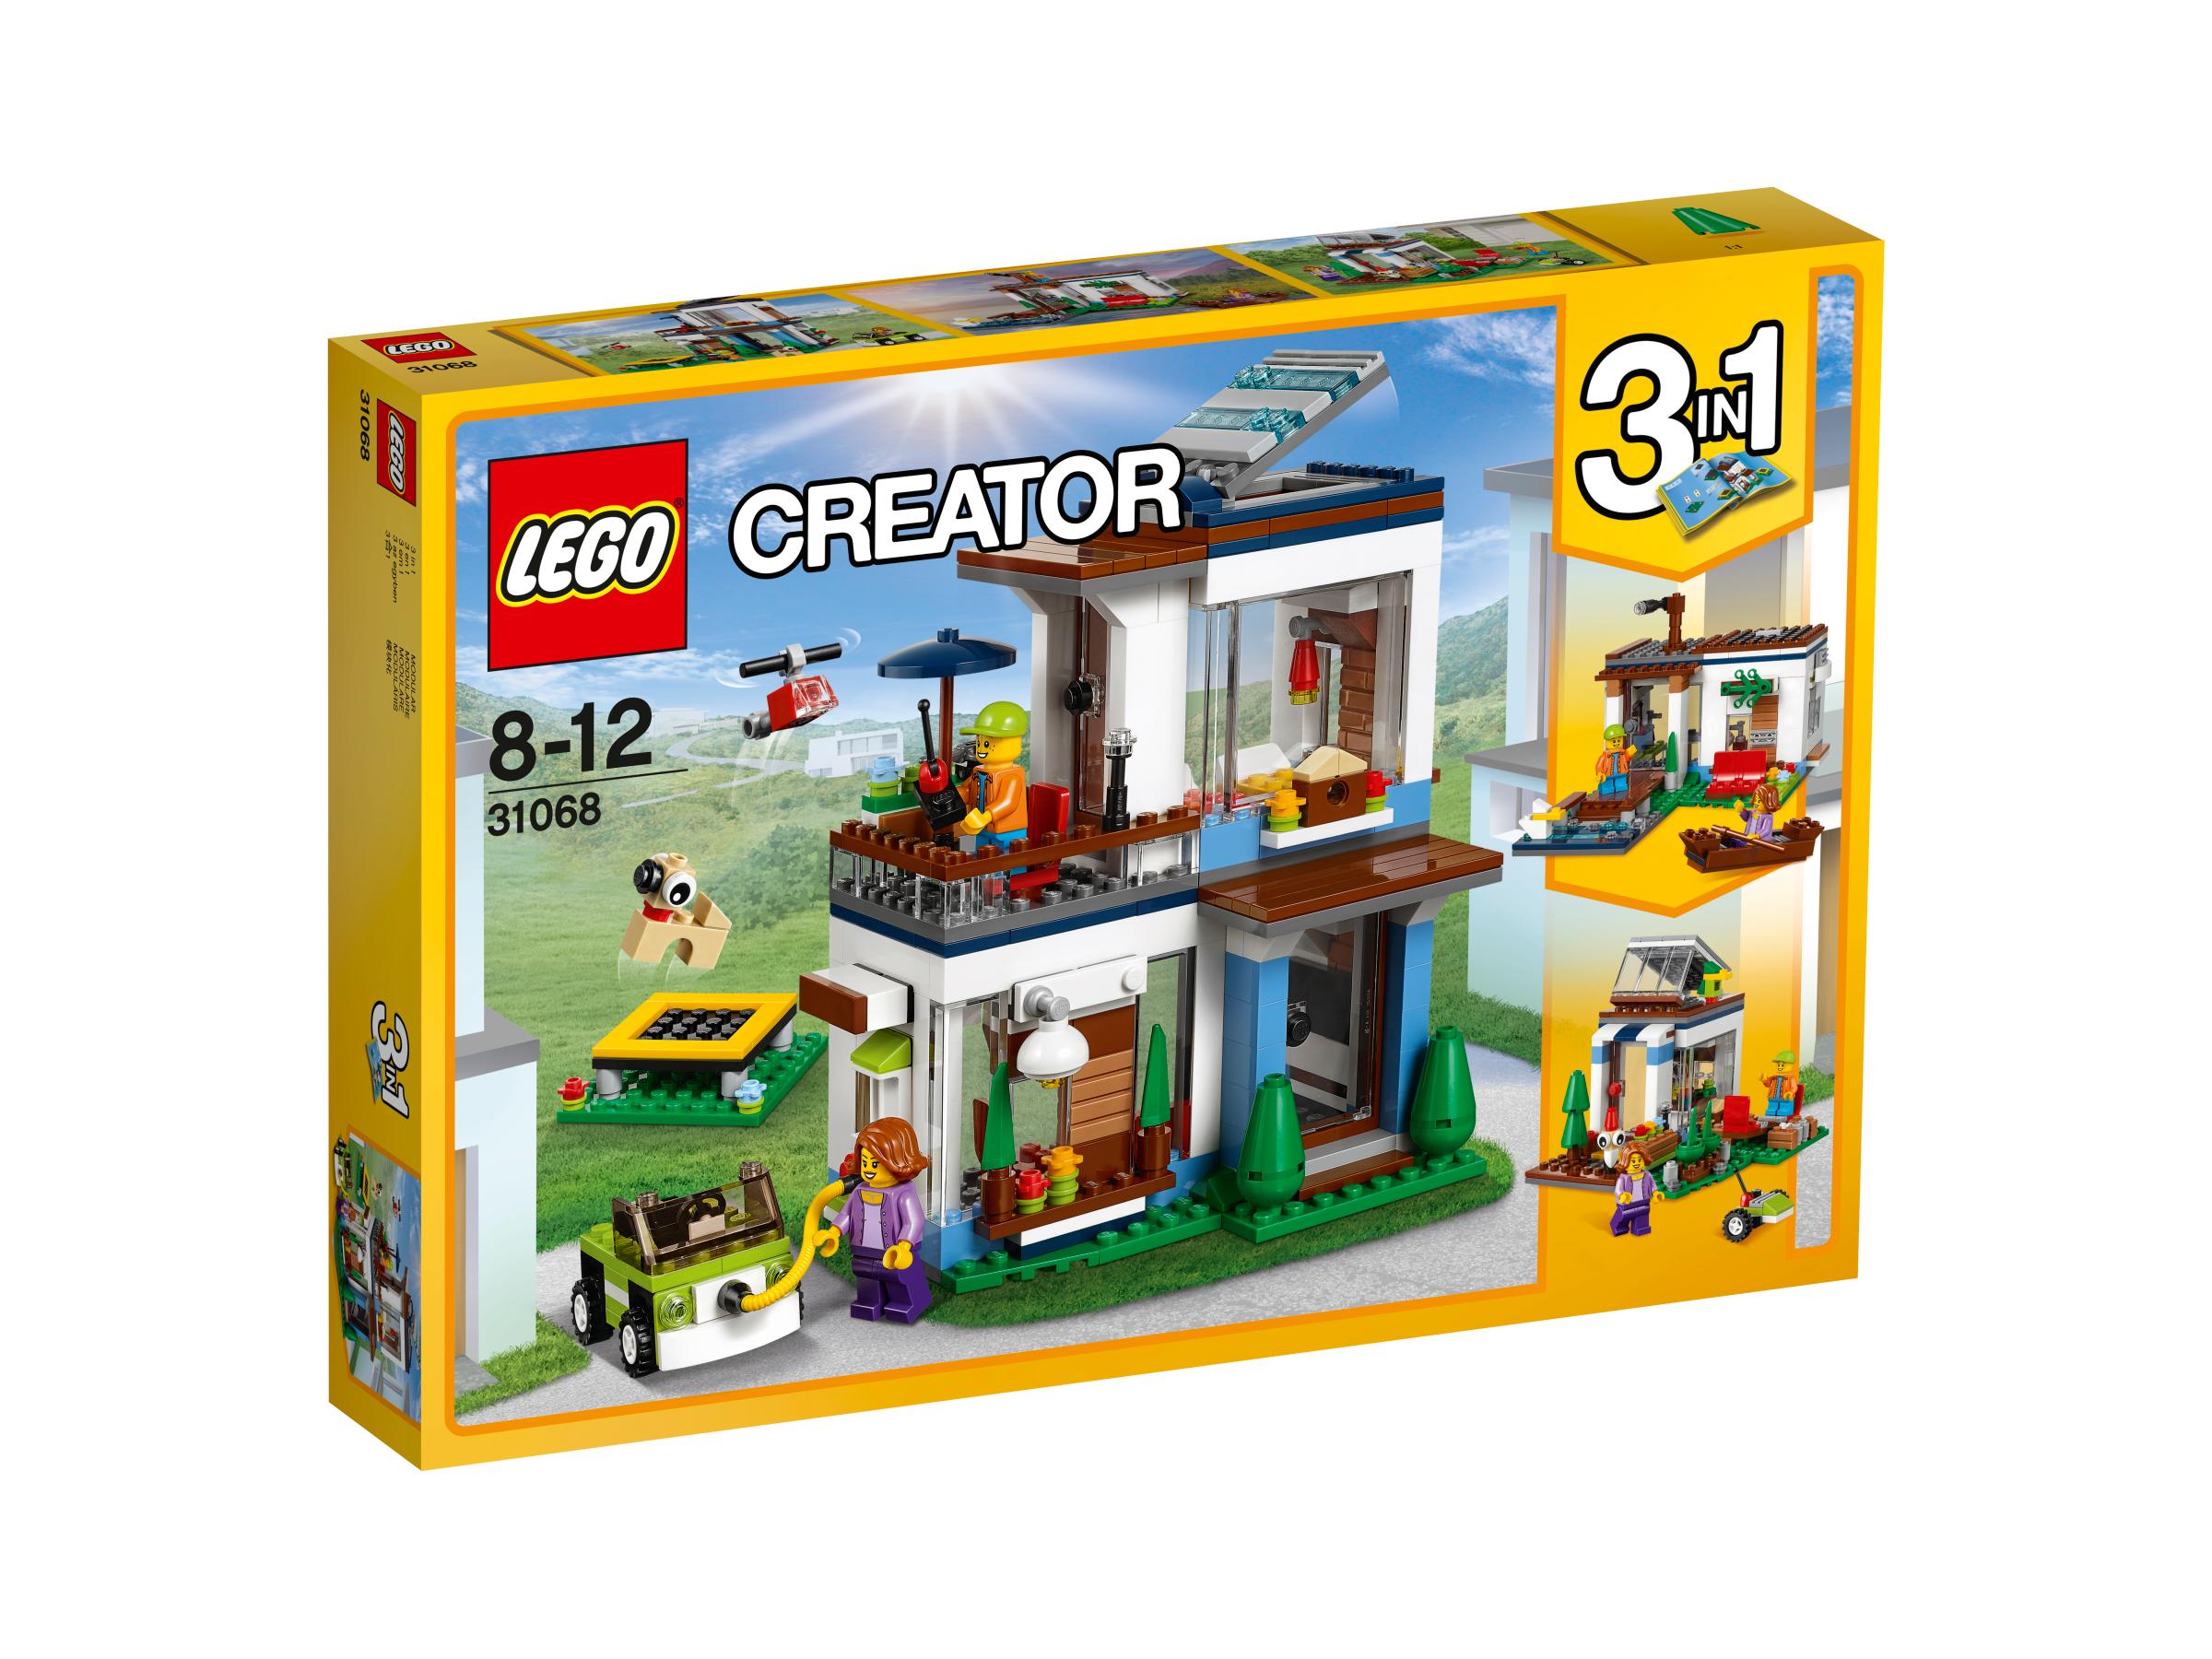 18aca4a9d5a LEGO Creator 3-in-1 - 31068 Modular Modern Home - Pandemonium